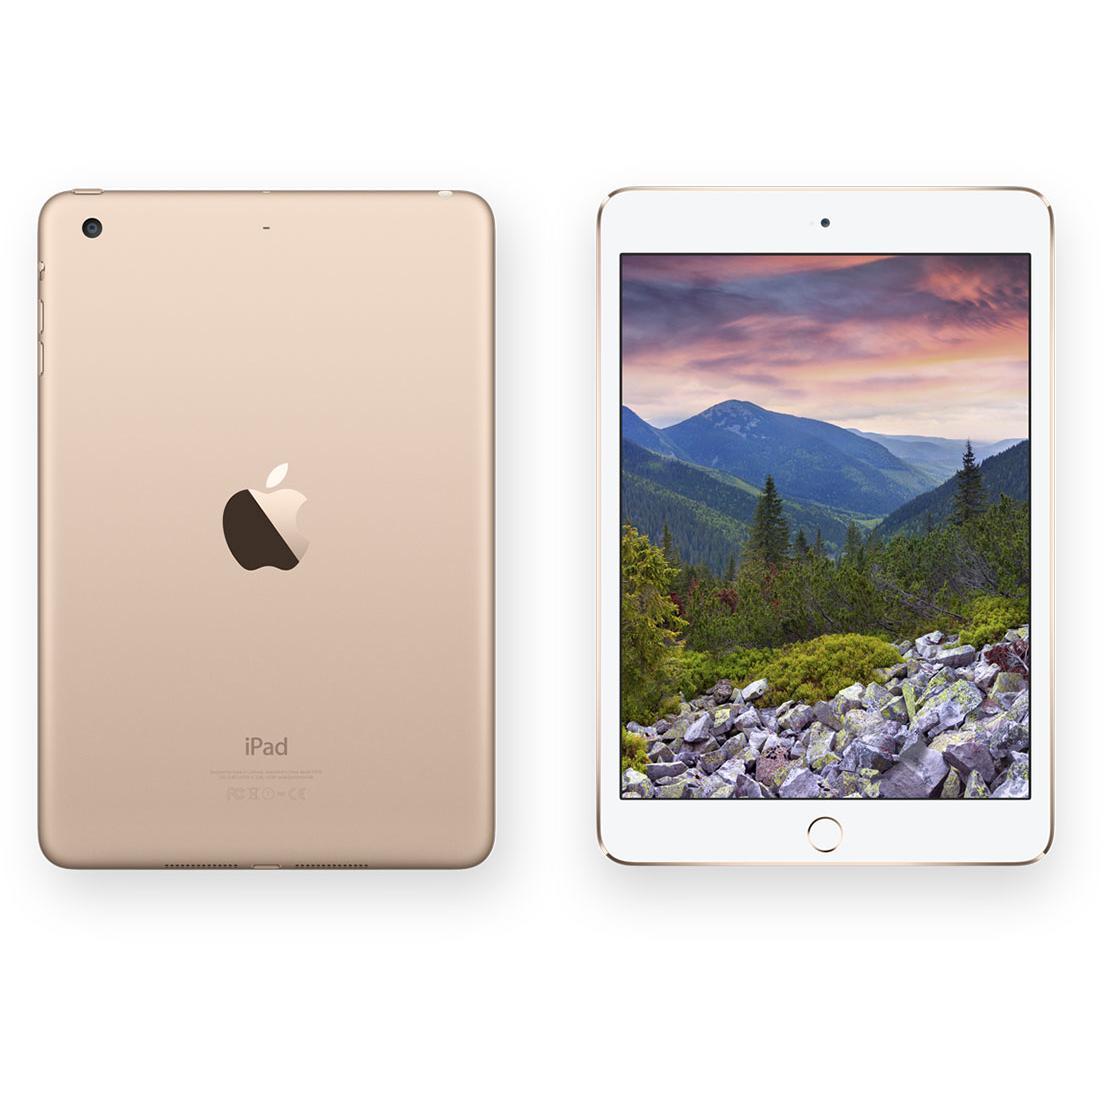 iPad mini 3 16GB LTE - Gold - Ohne Vertrag